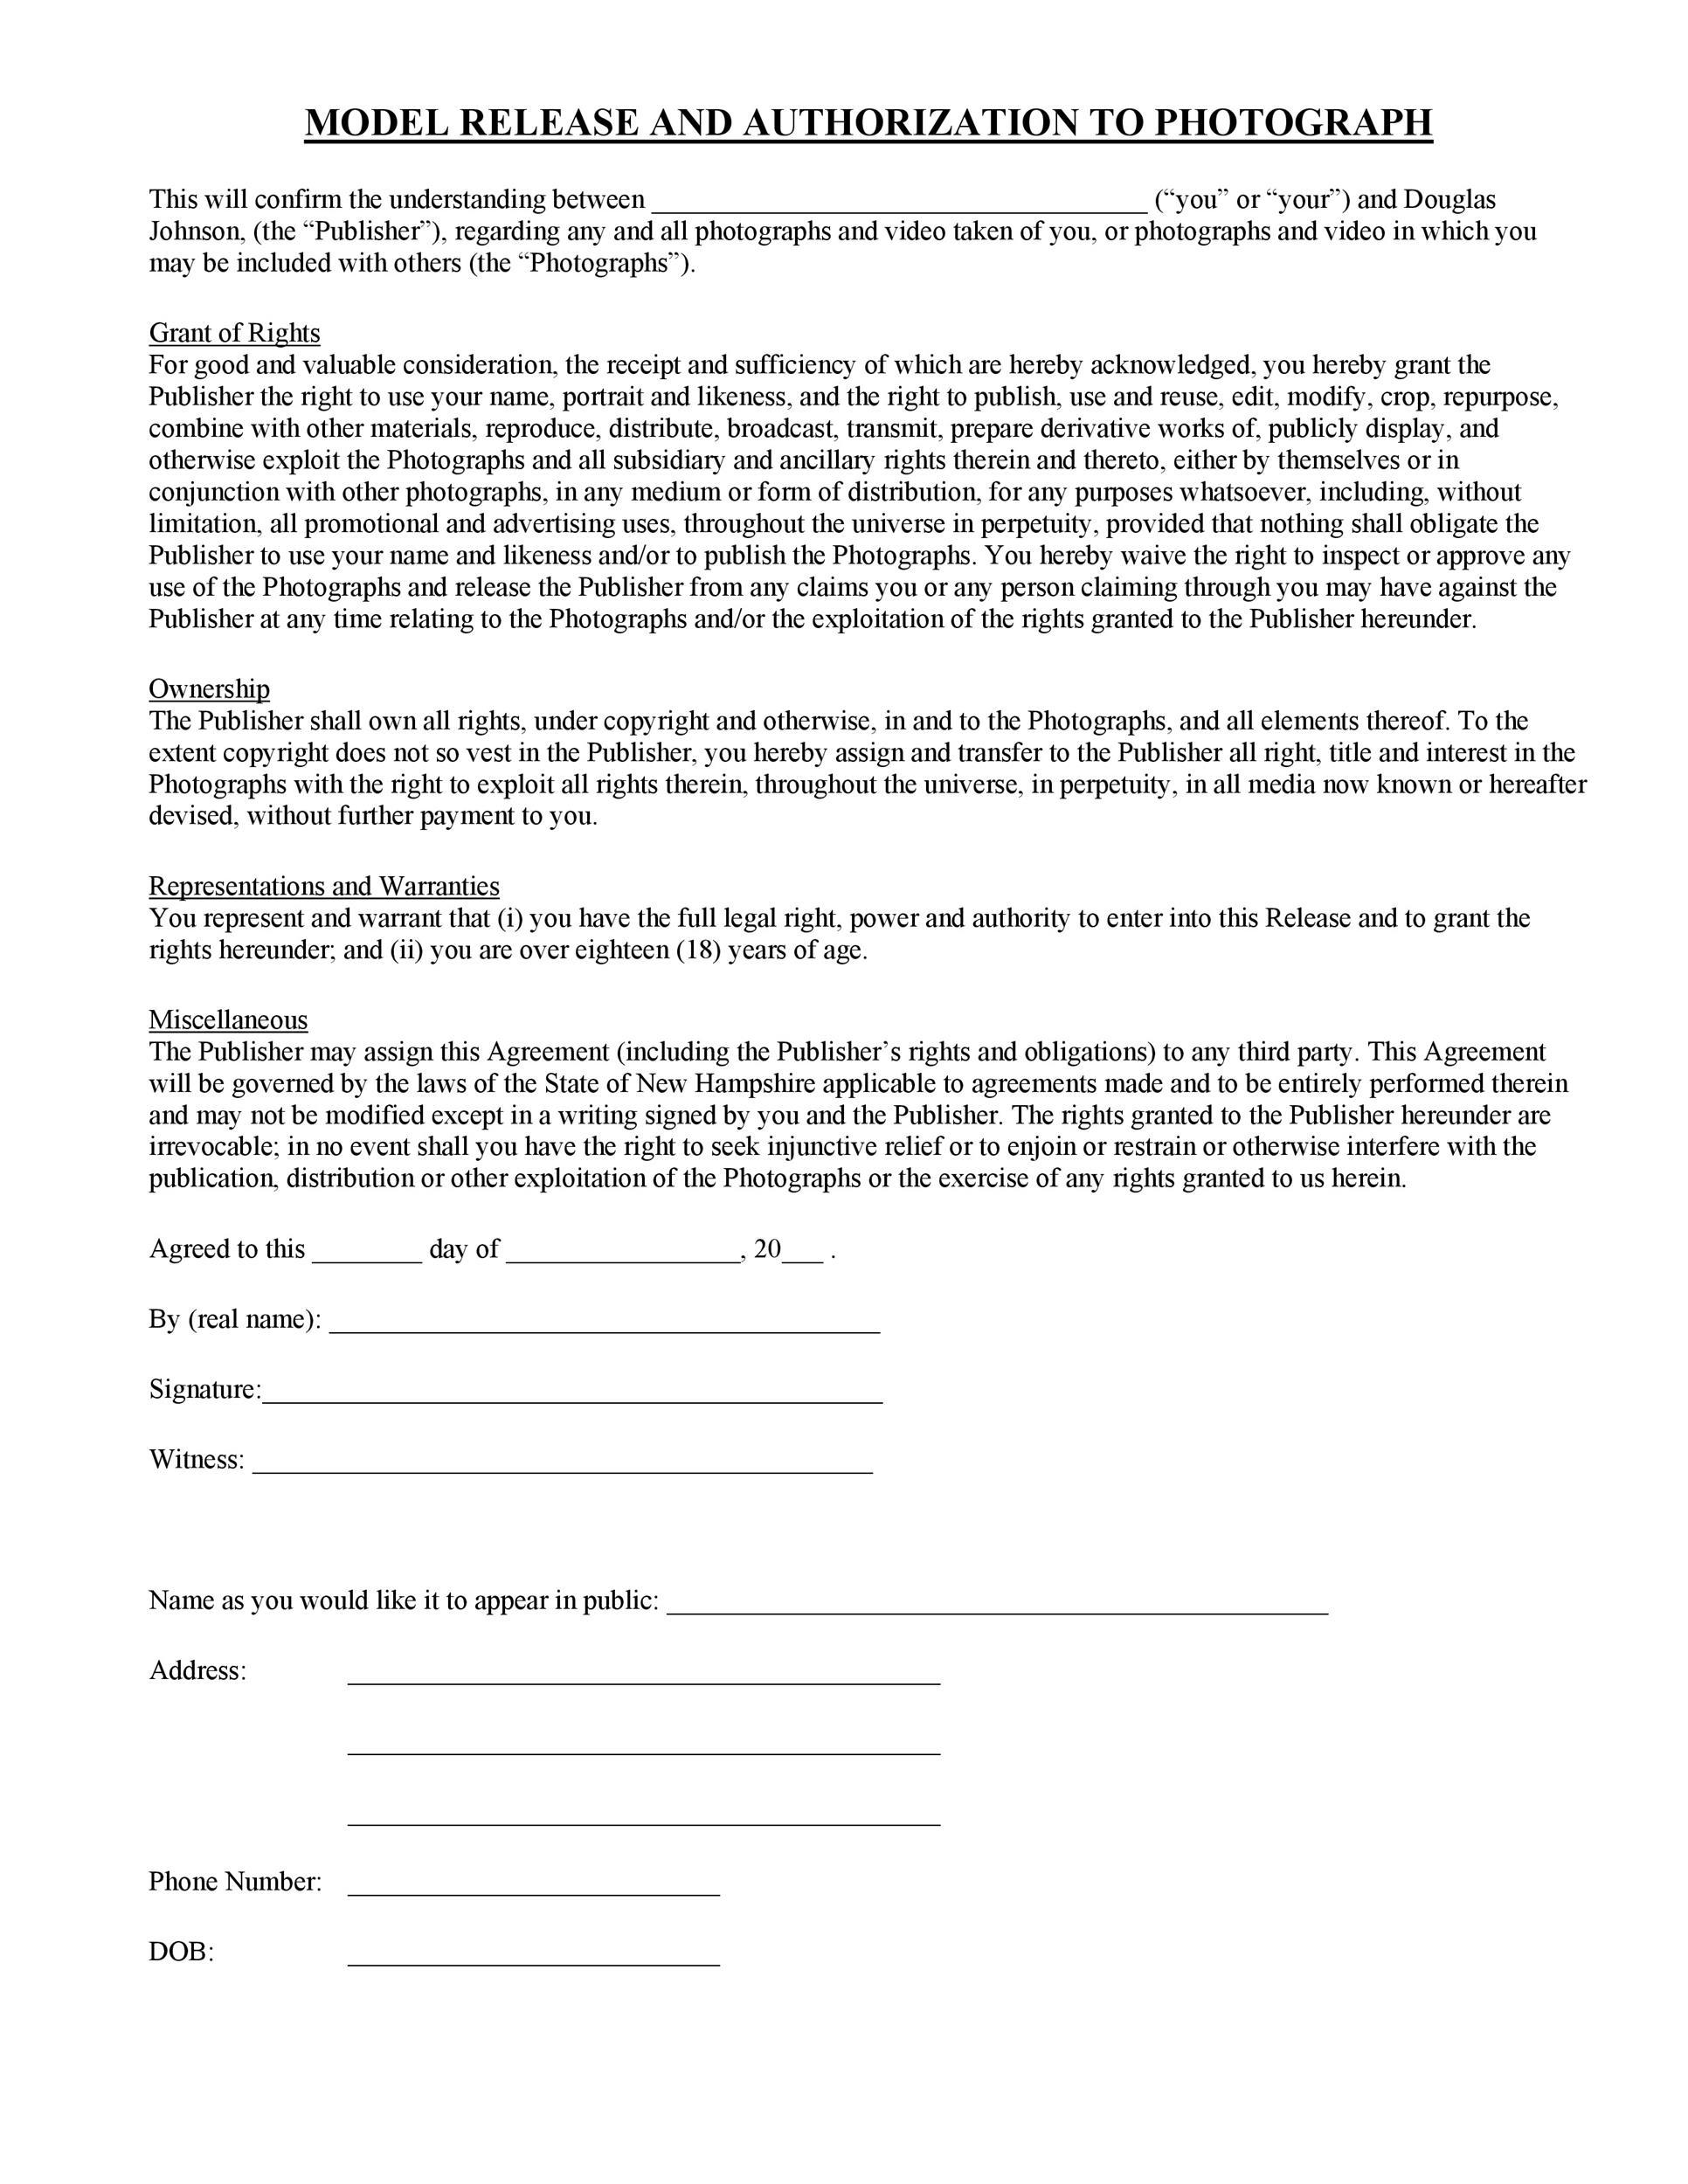 Free model release form 28